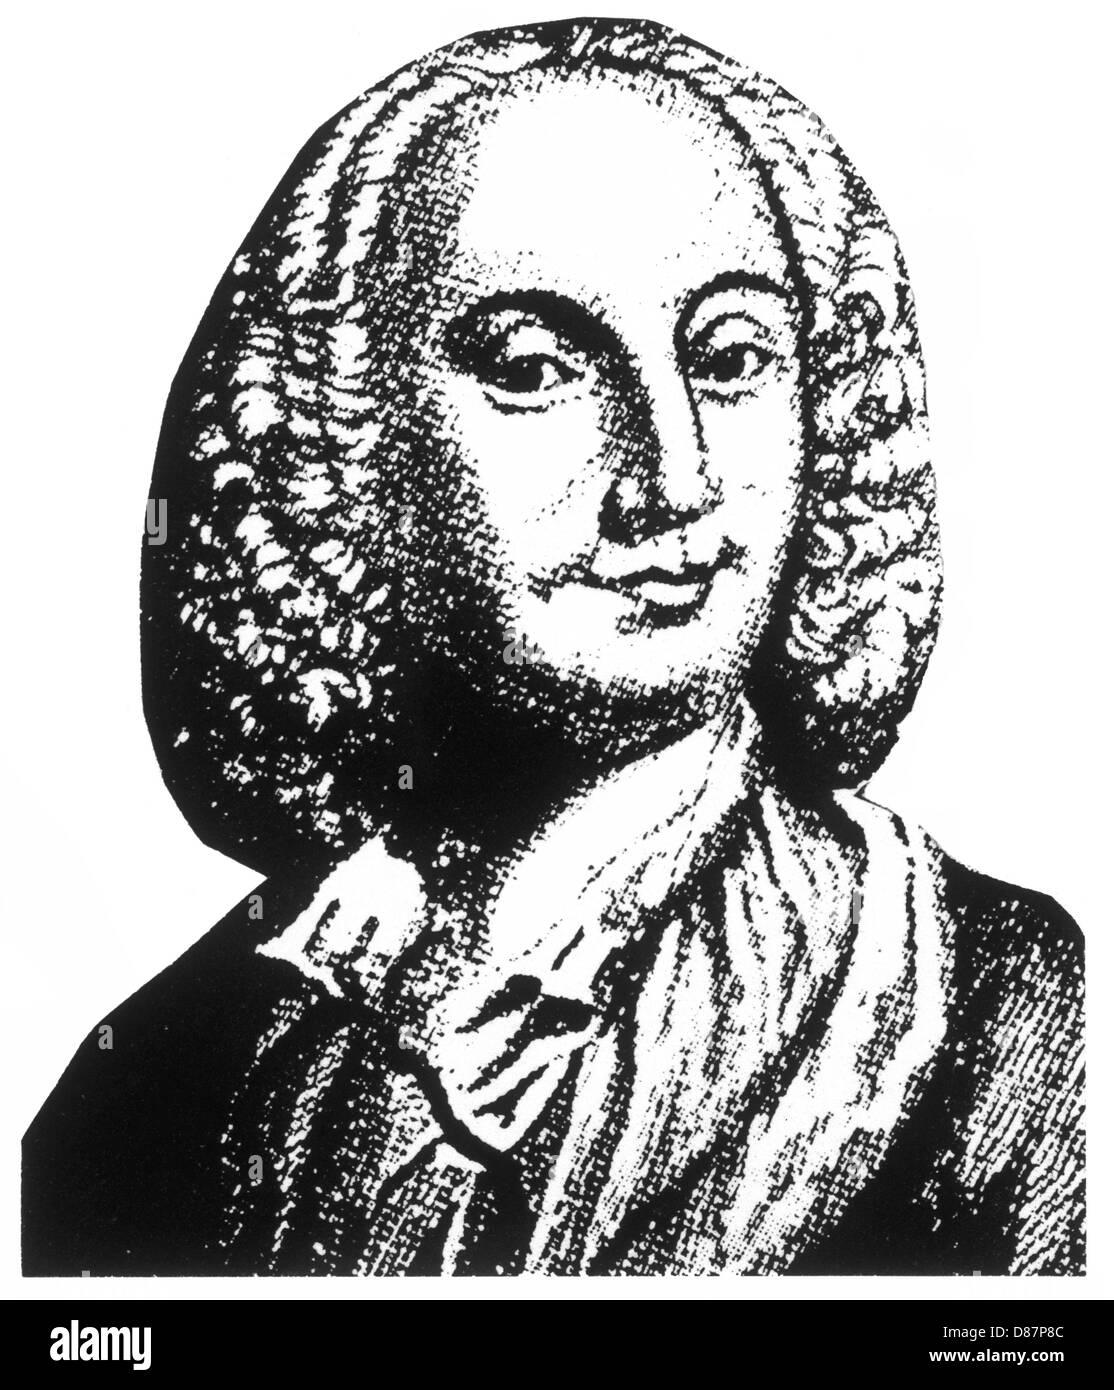 Antonio Vivaldi Anon Eng - Stock Image